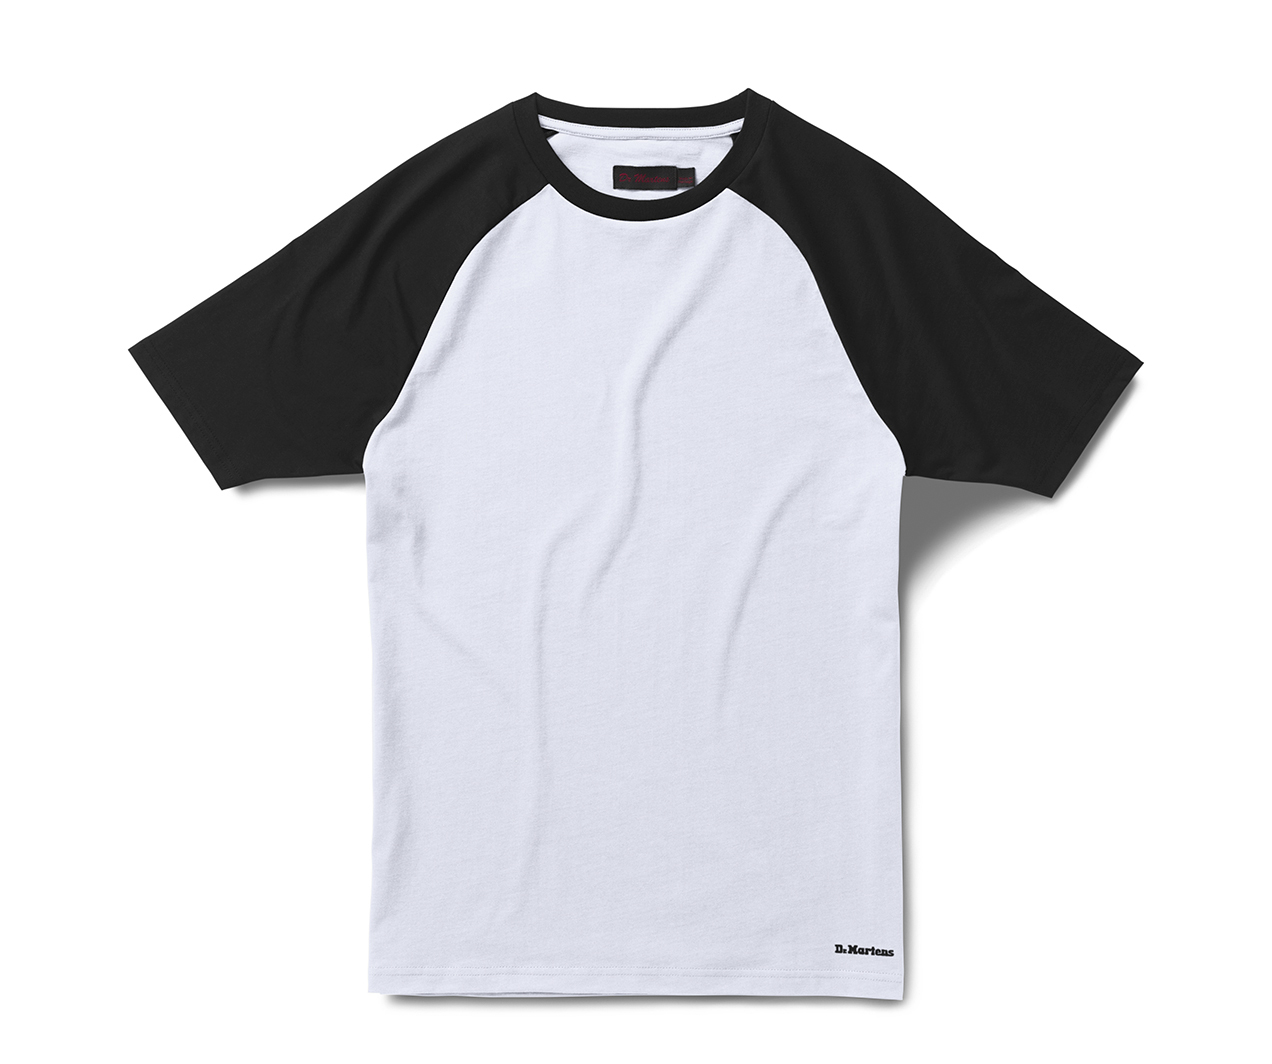 Black t shirt short sleeve - Short Sleeve Raglan T Shirt